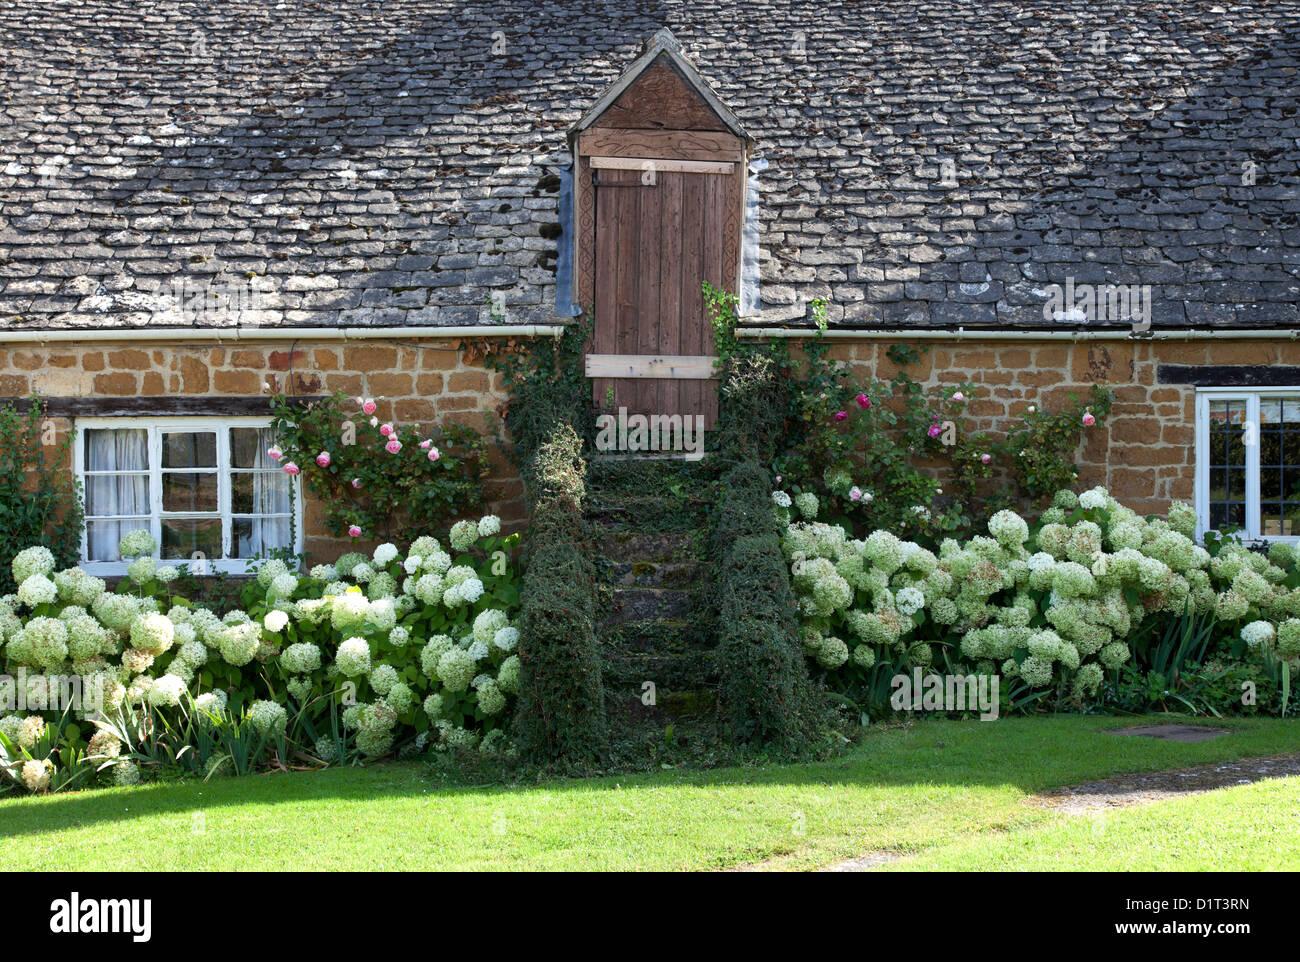 Cotswold barn conversion with white Hydrangea border - Stock Image